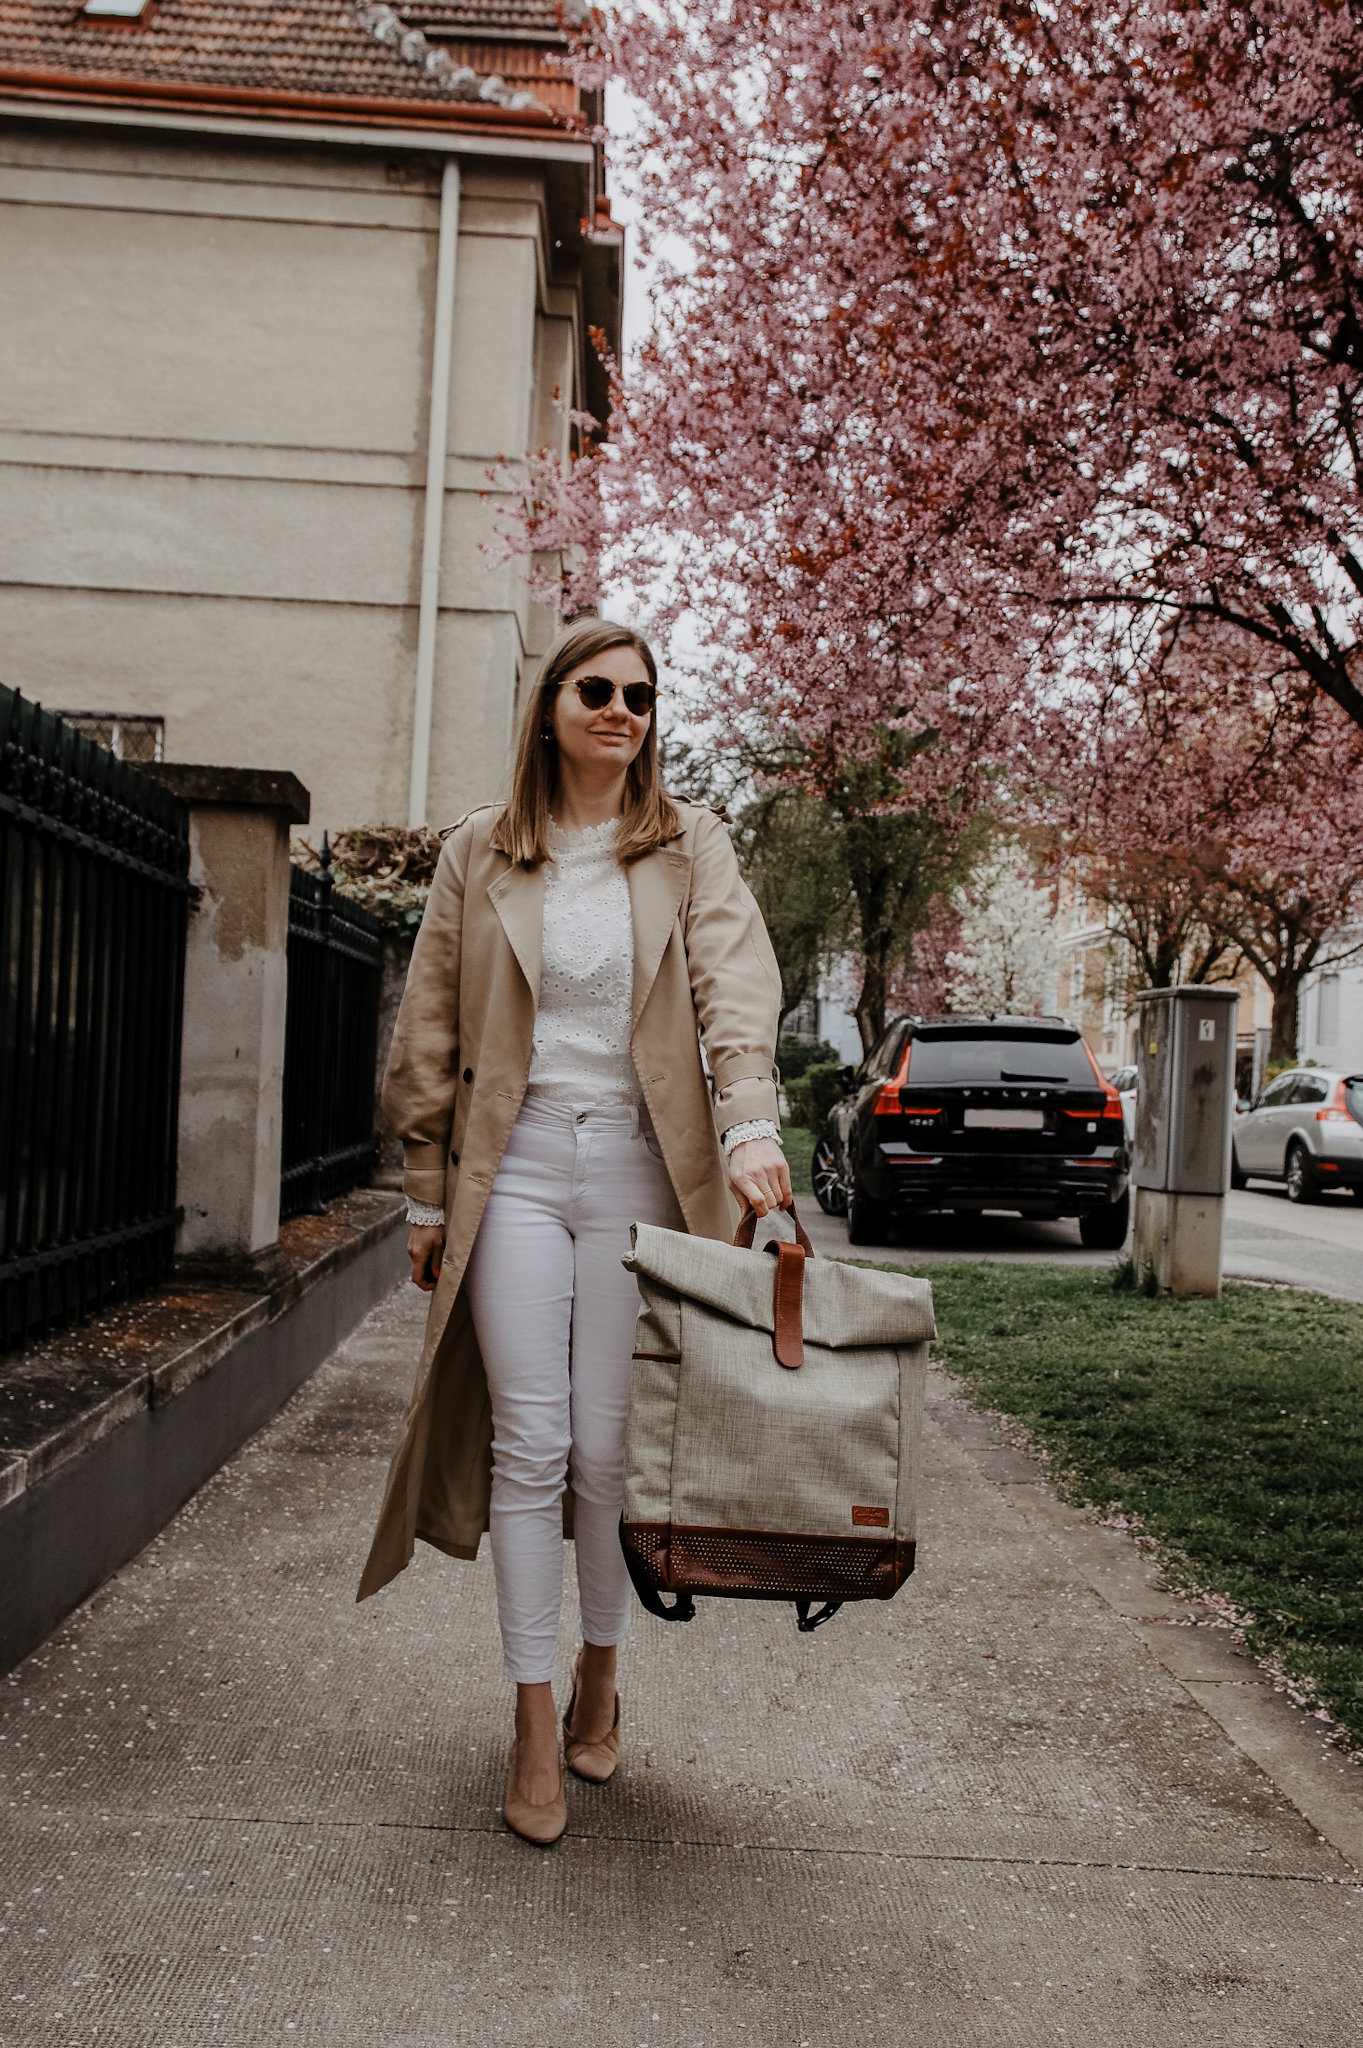 Trenchcoat, jeans, Gusti Leder Rucksack, backpack, cherry blossom, spring outfit